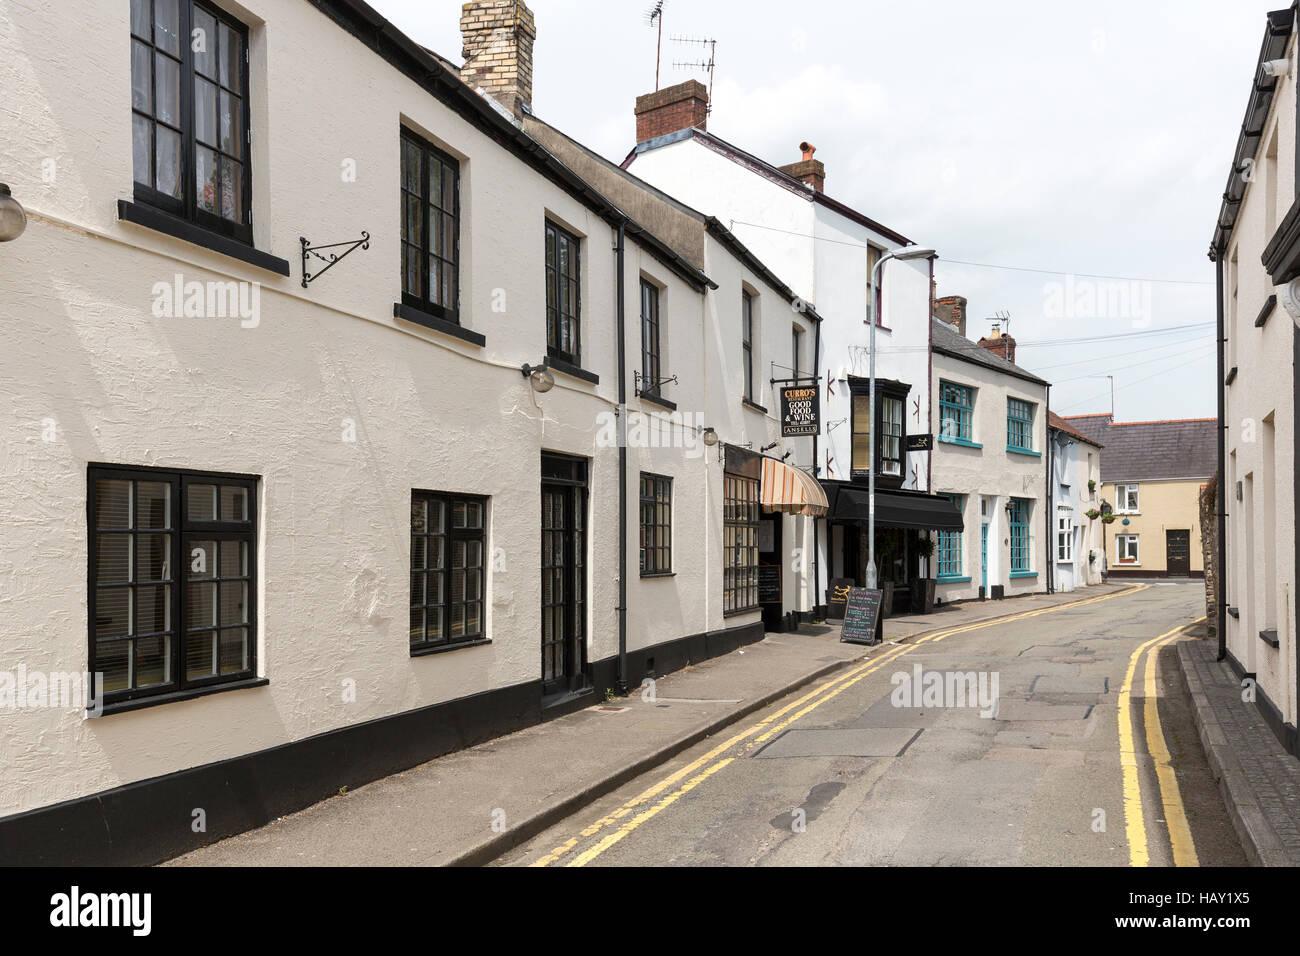 Narrow road with no parking markings, Caerleon, Wales, UK - Stock Image